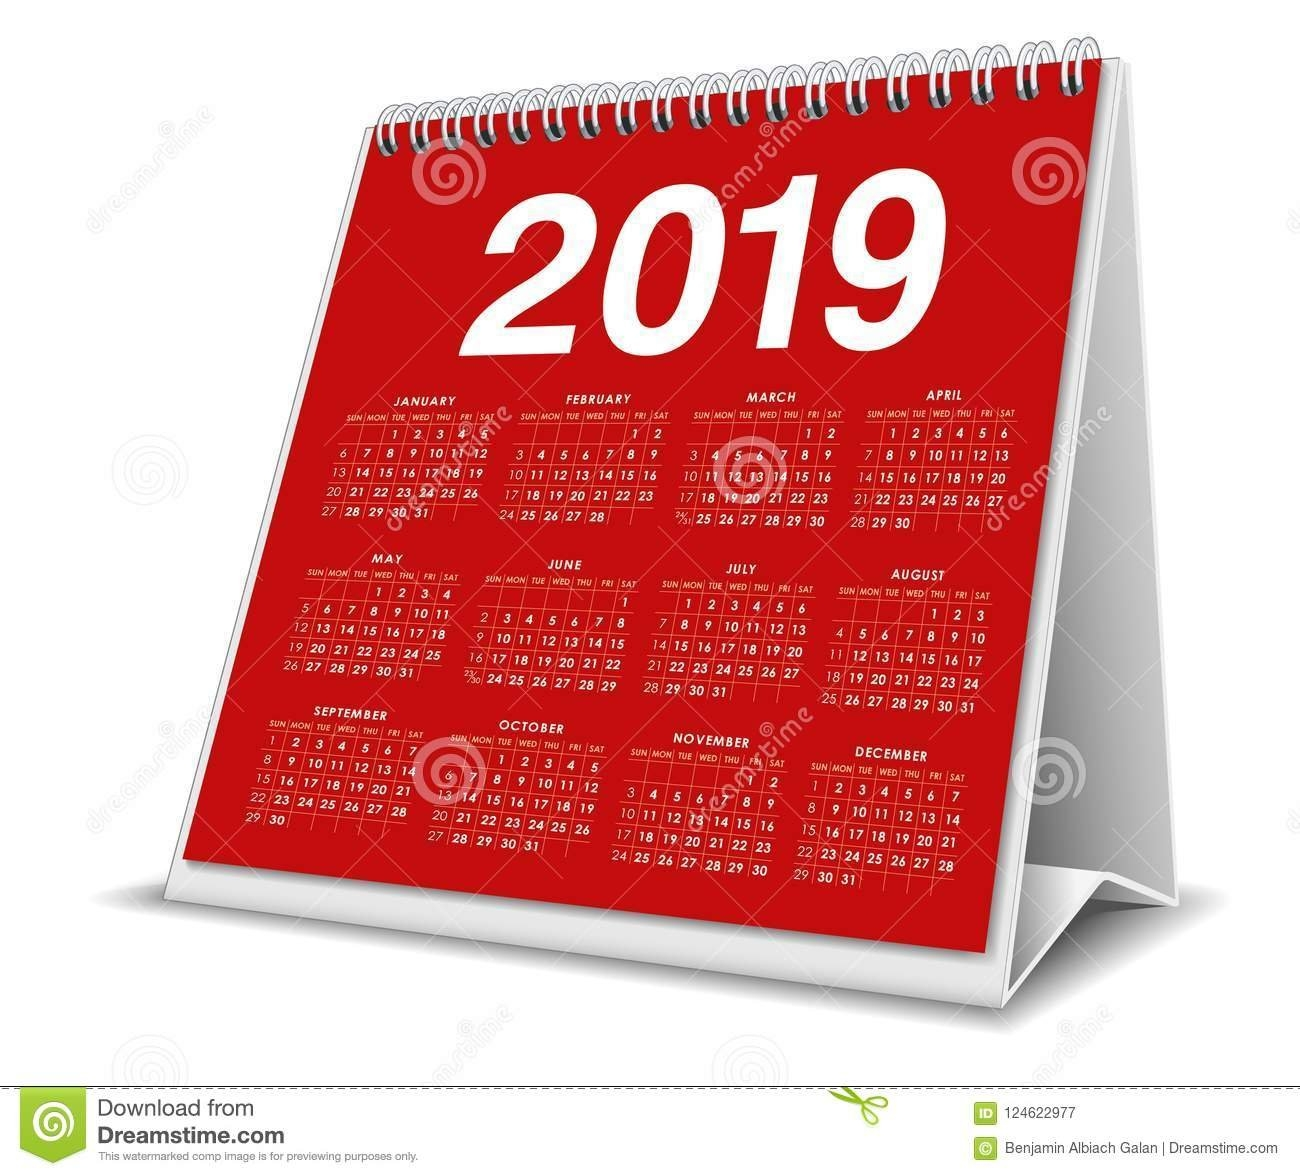 Calendar Desktop 2019 In Red Color Stock Vector - Illustration Of Calendar 2019 3D